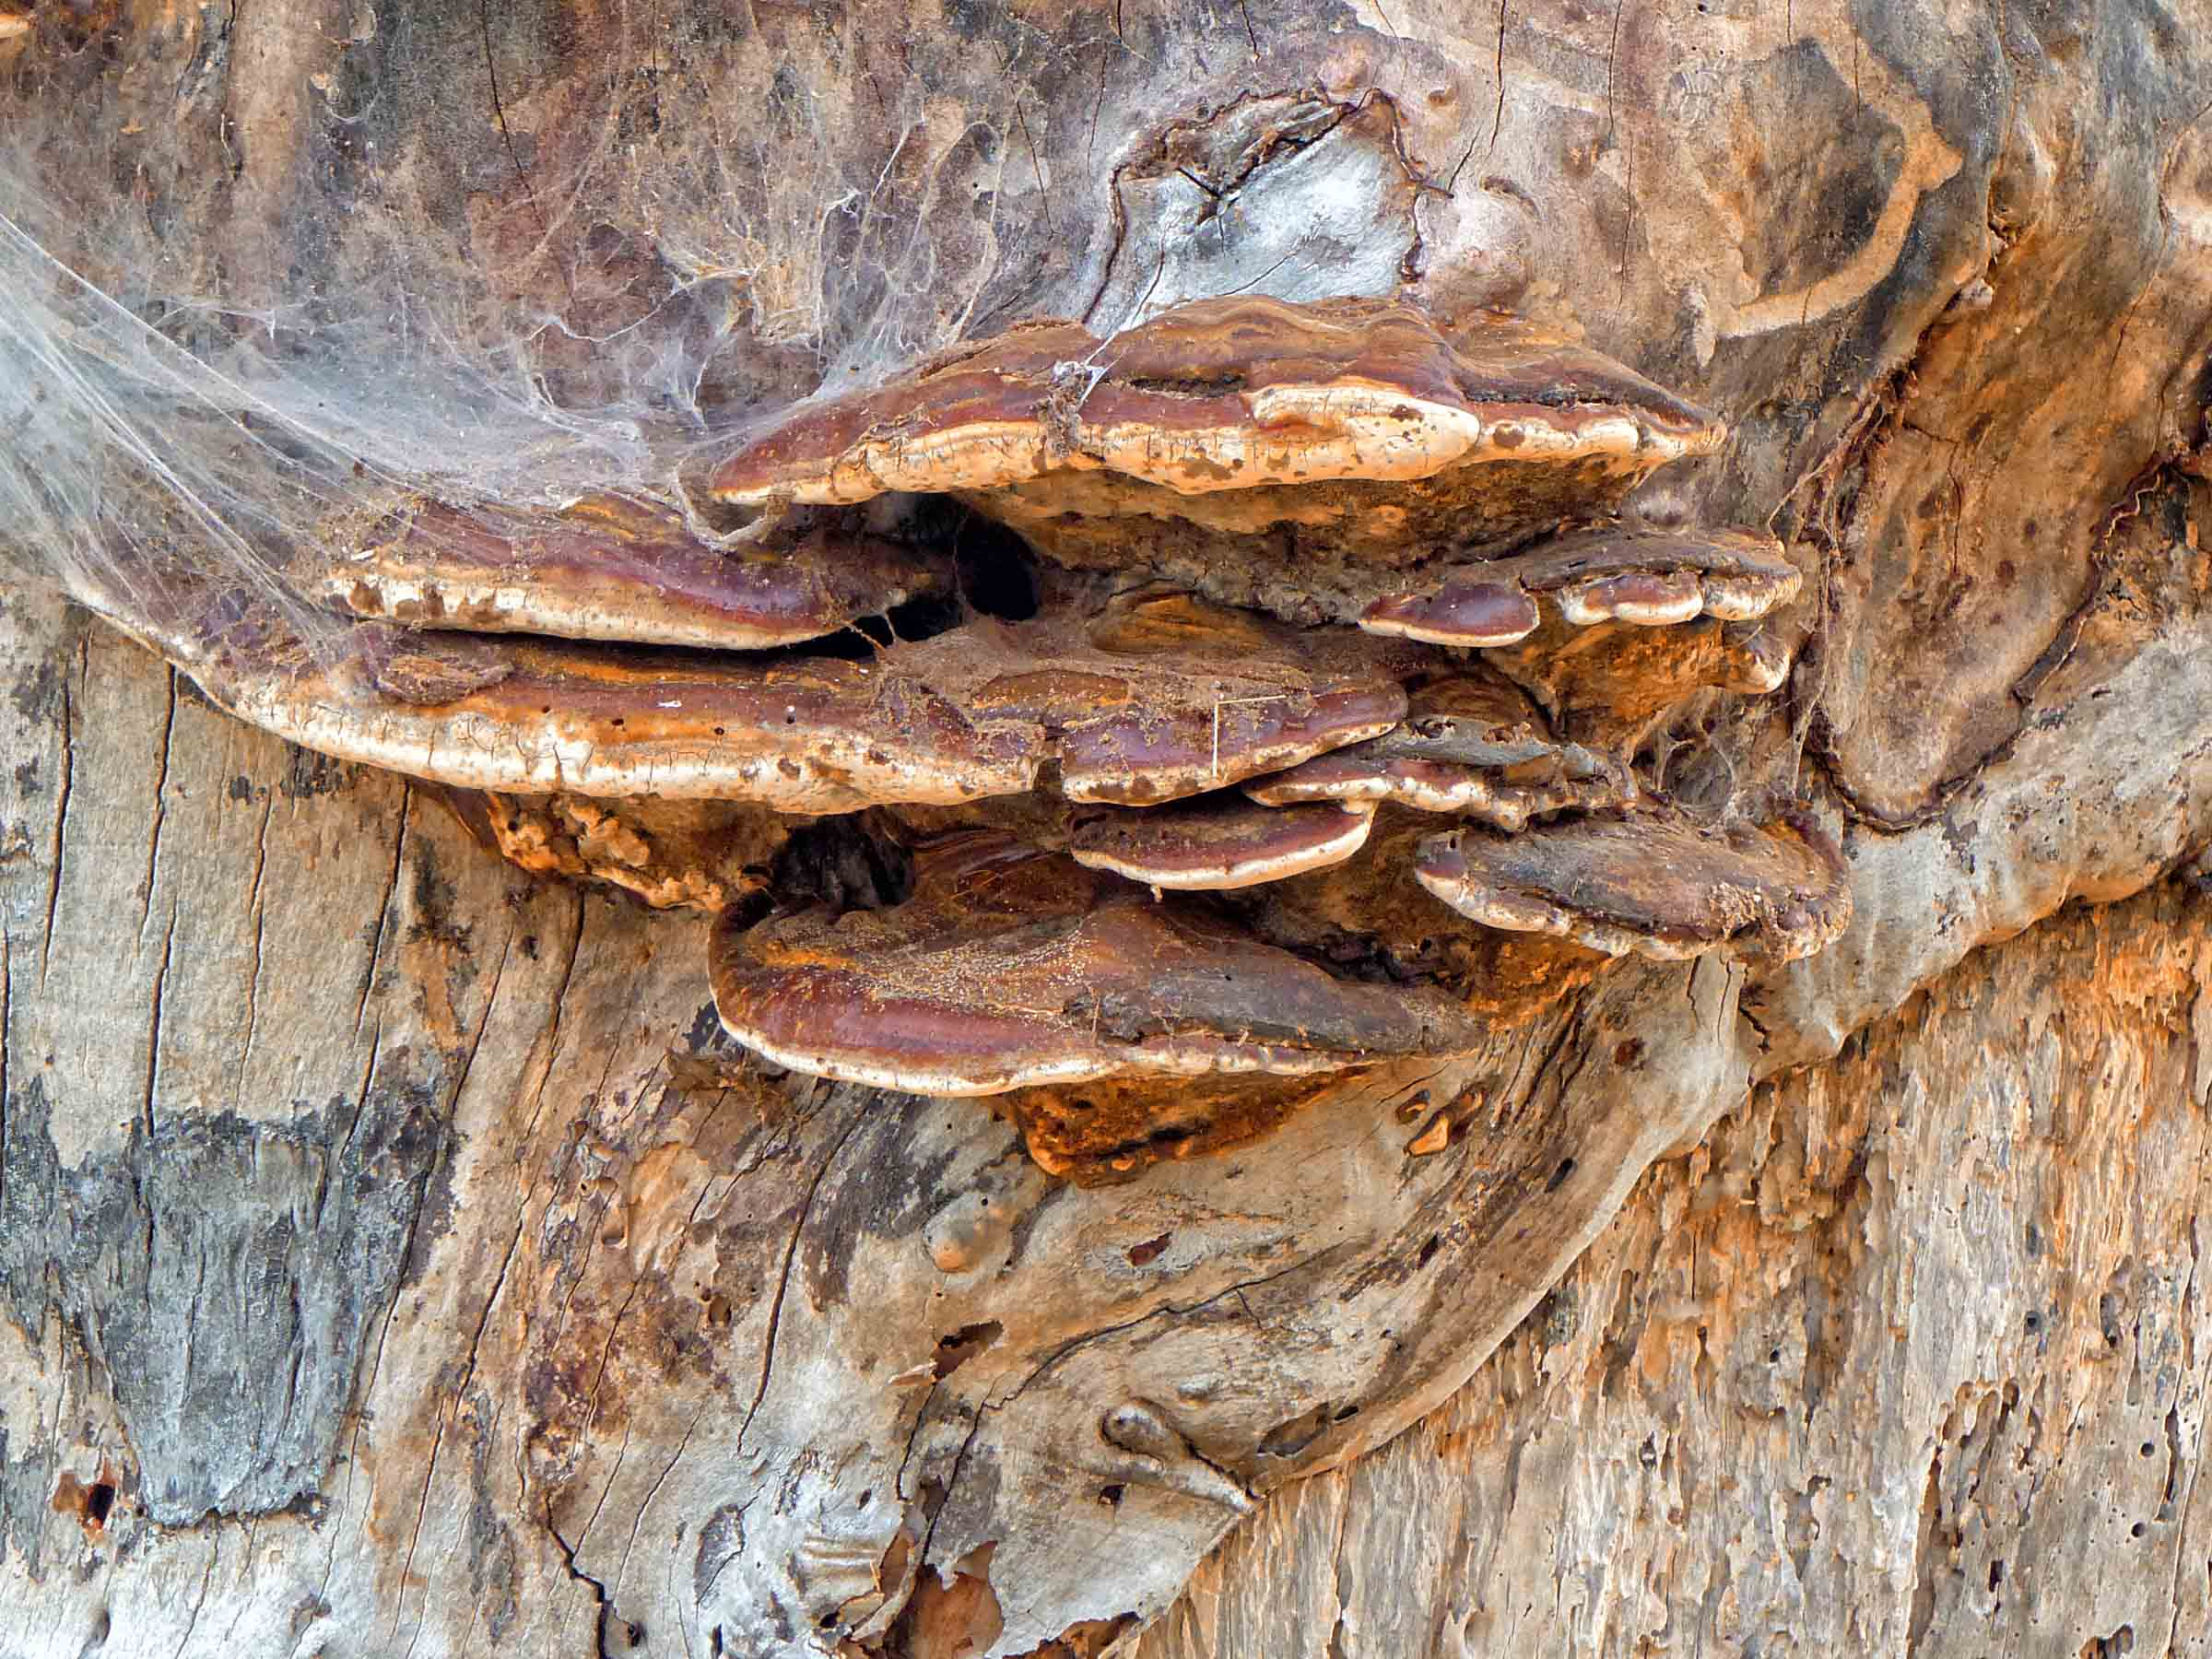 Bracket fungus and cobwebs on tree trunk